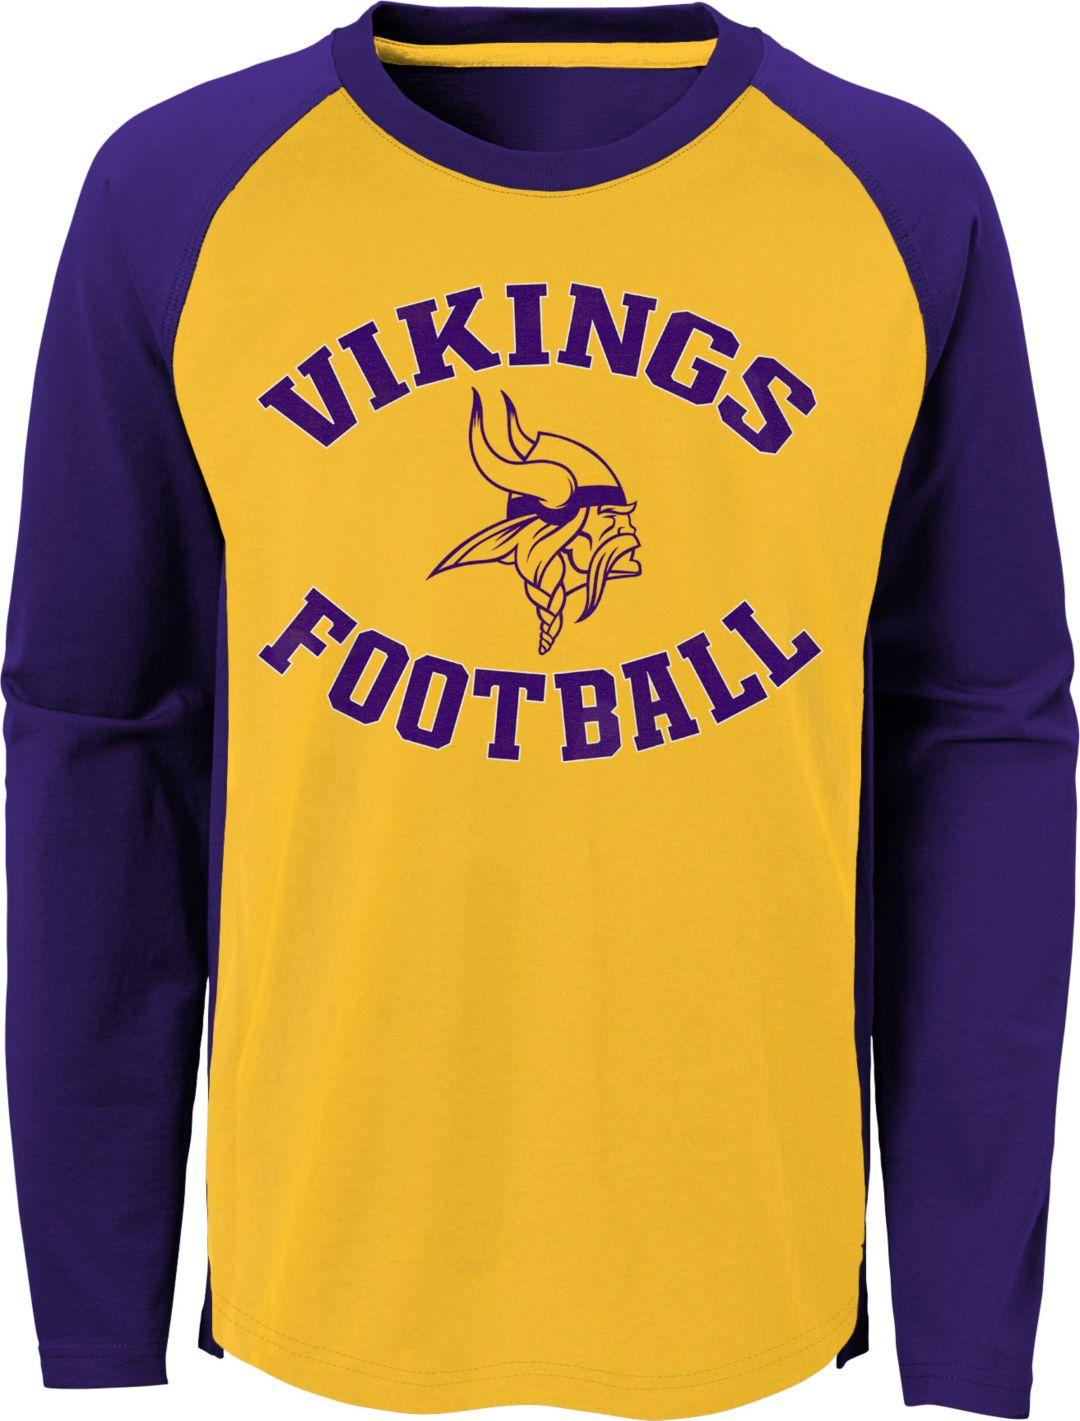 brand new e6cd8 3df62 NFL Team Apparel Youth Minnesota Vikings Air Raid Long Sleeve Purple Shirt